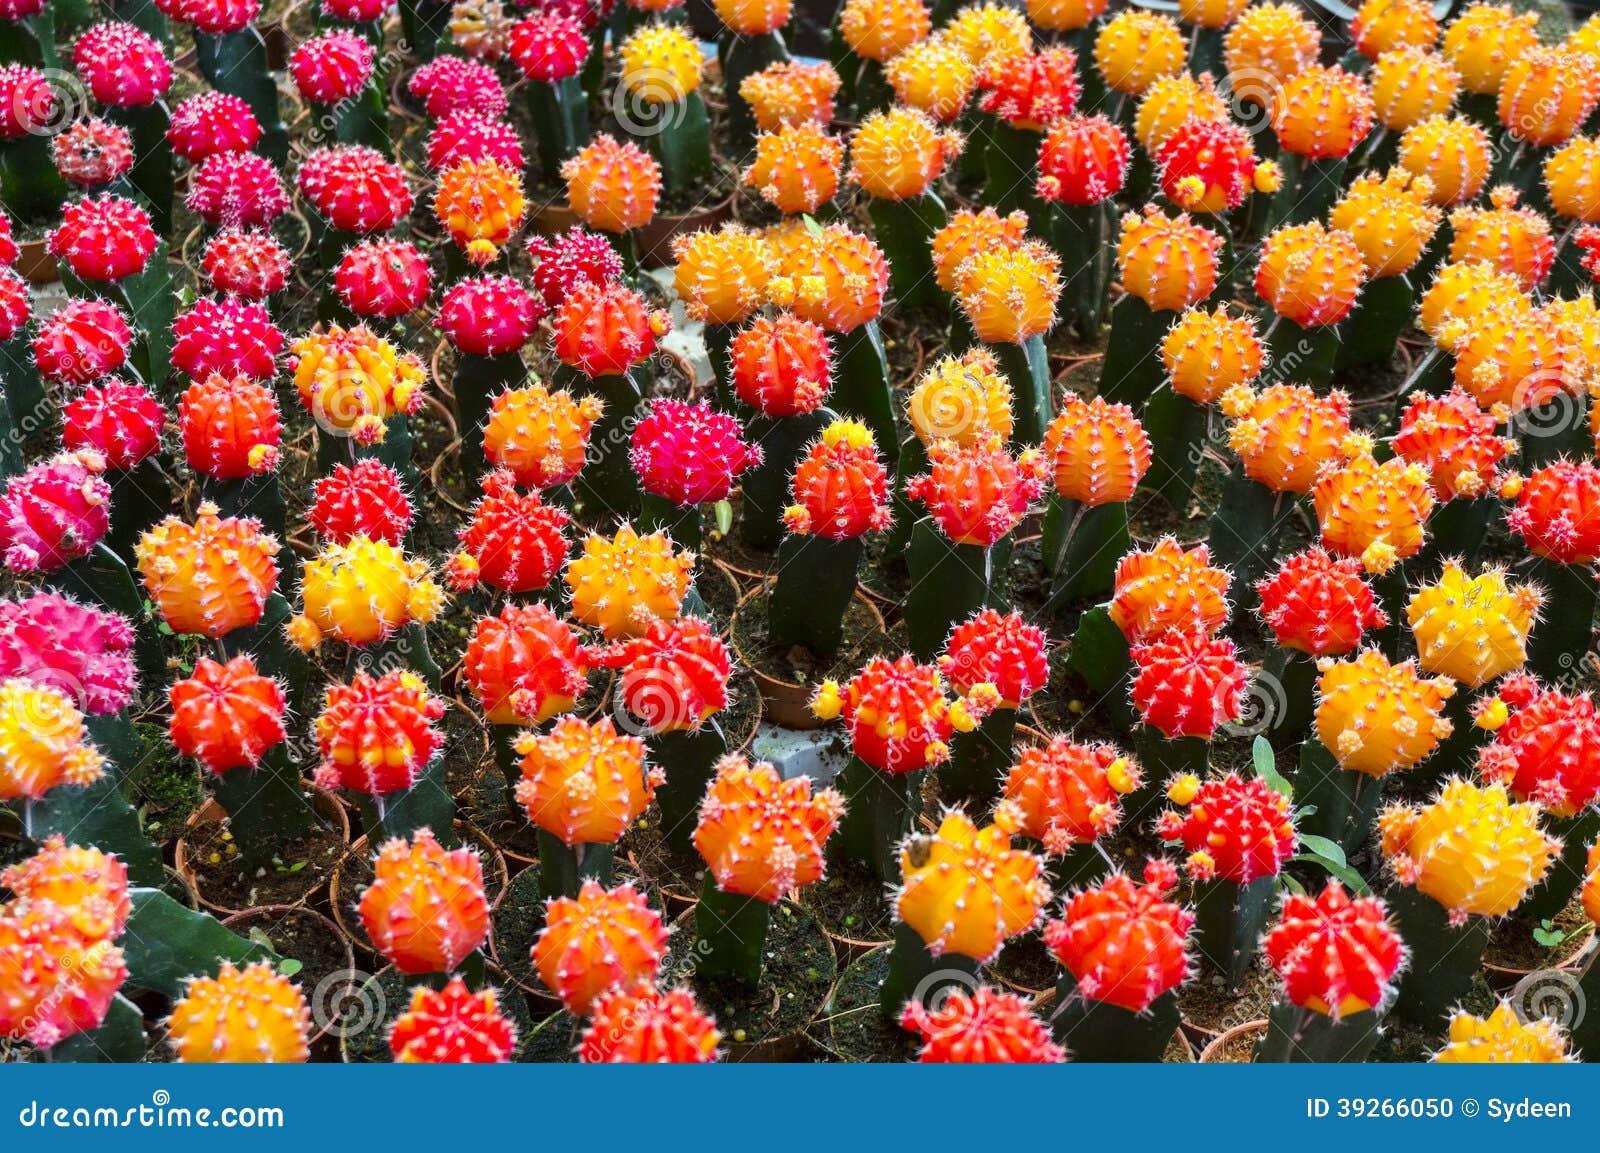 colorful mini cactus stock photo image 39266050. Black Bedroom Furniture Sets. Home Design Ideas